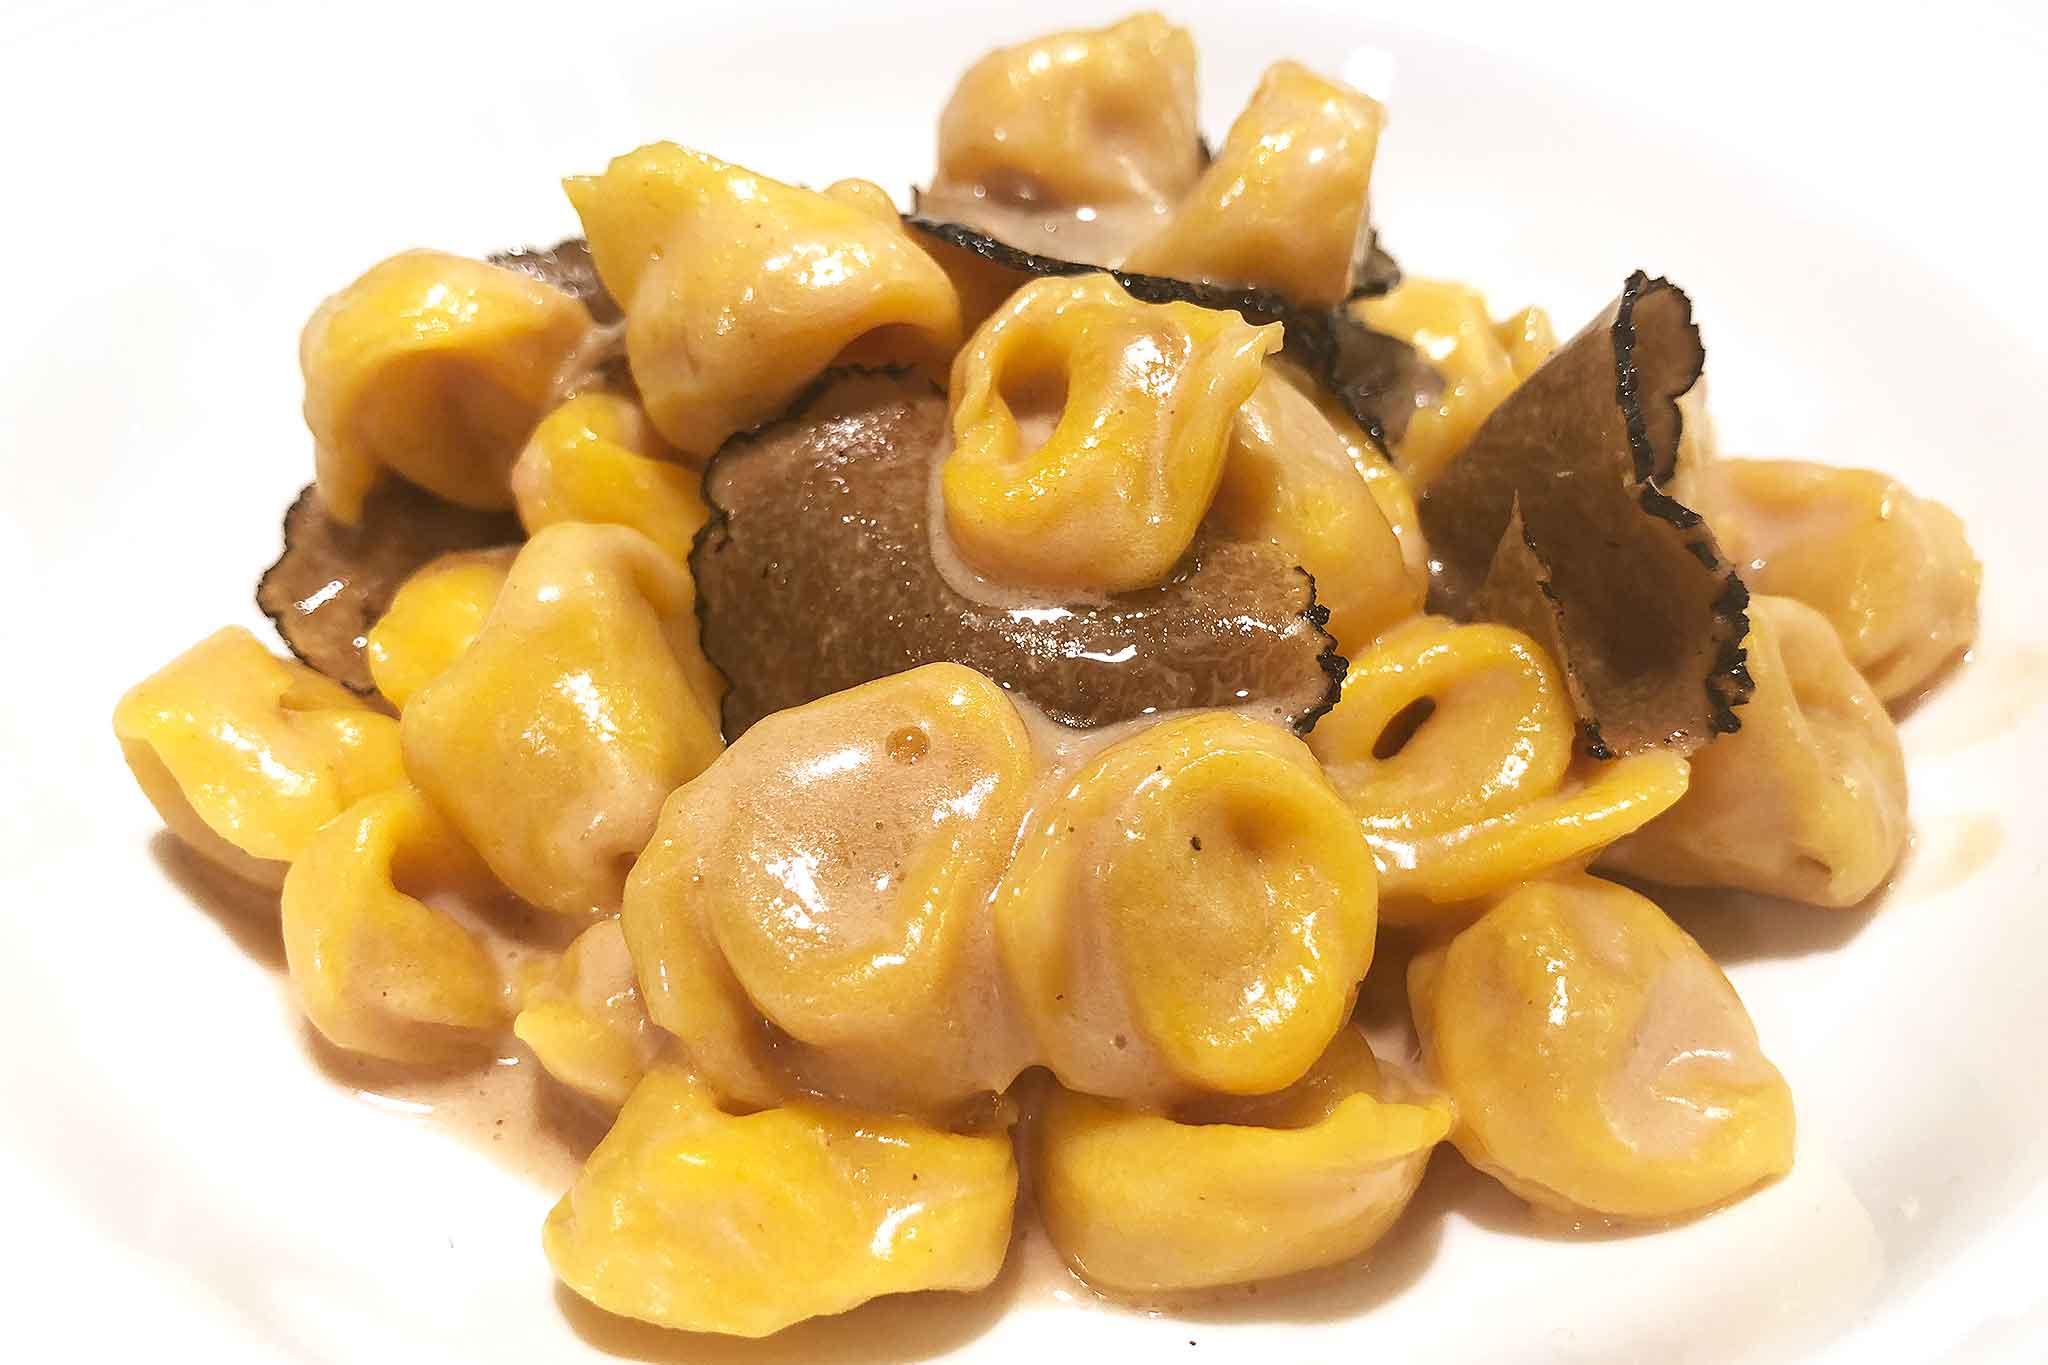 Cappelletti-di-cinta-senese-burro-nocciola-tartufo-bianco.jpg